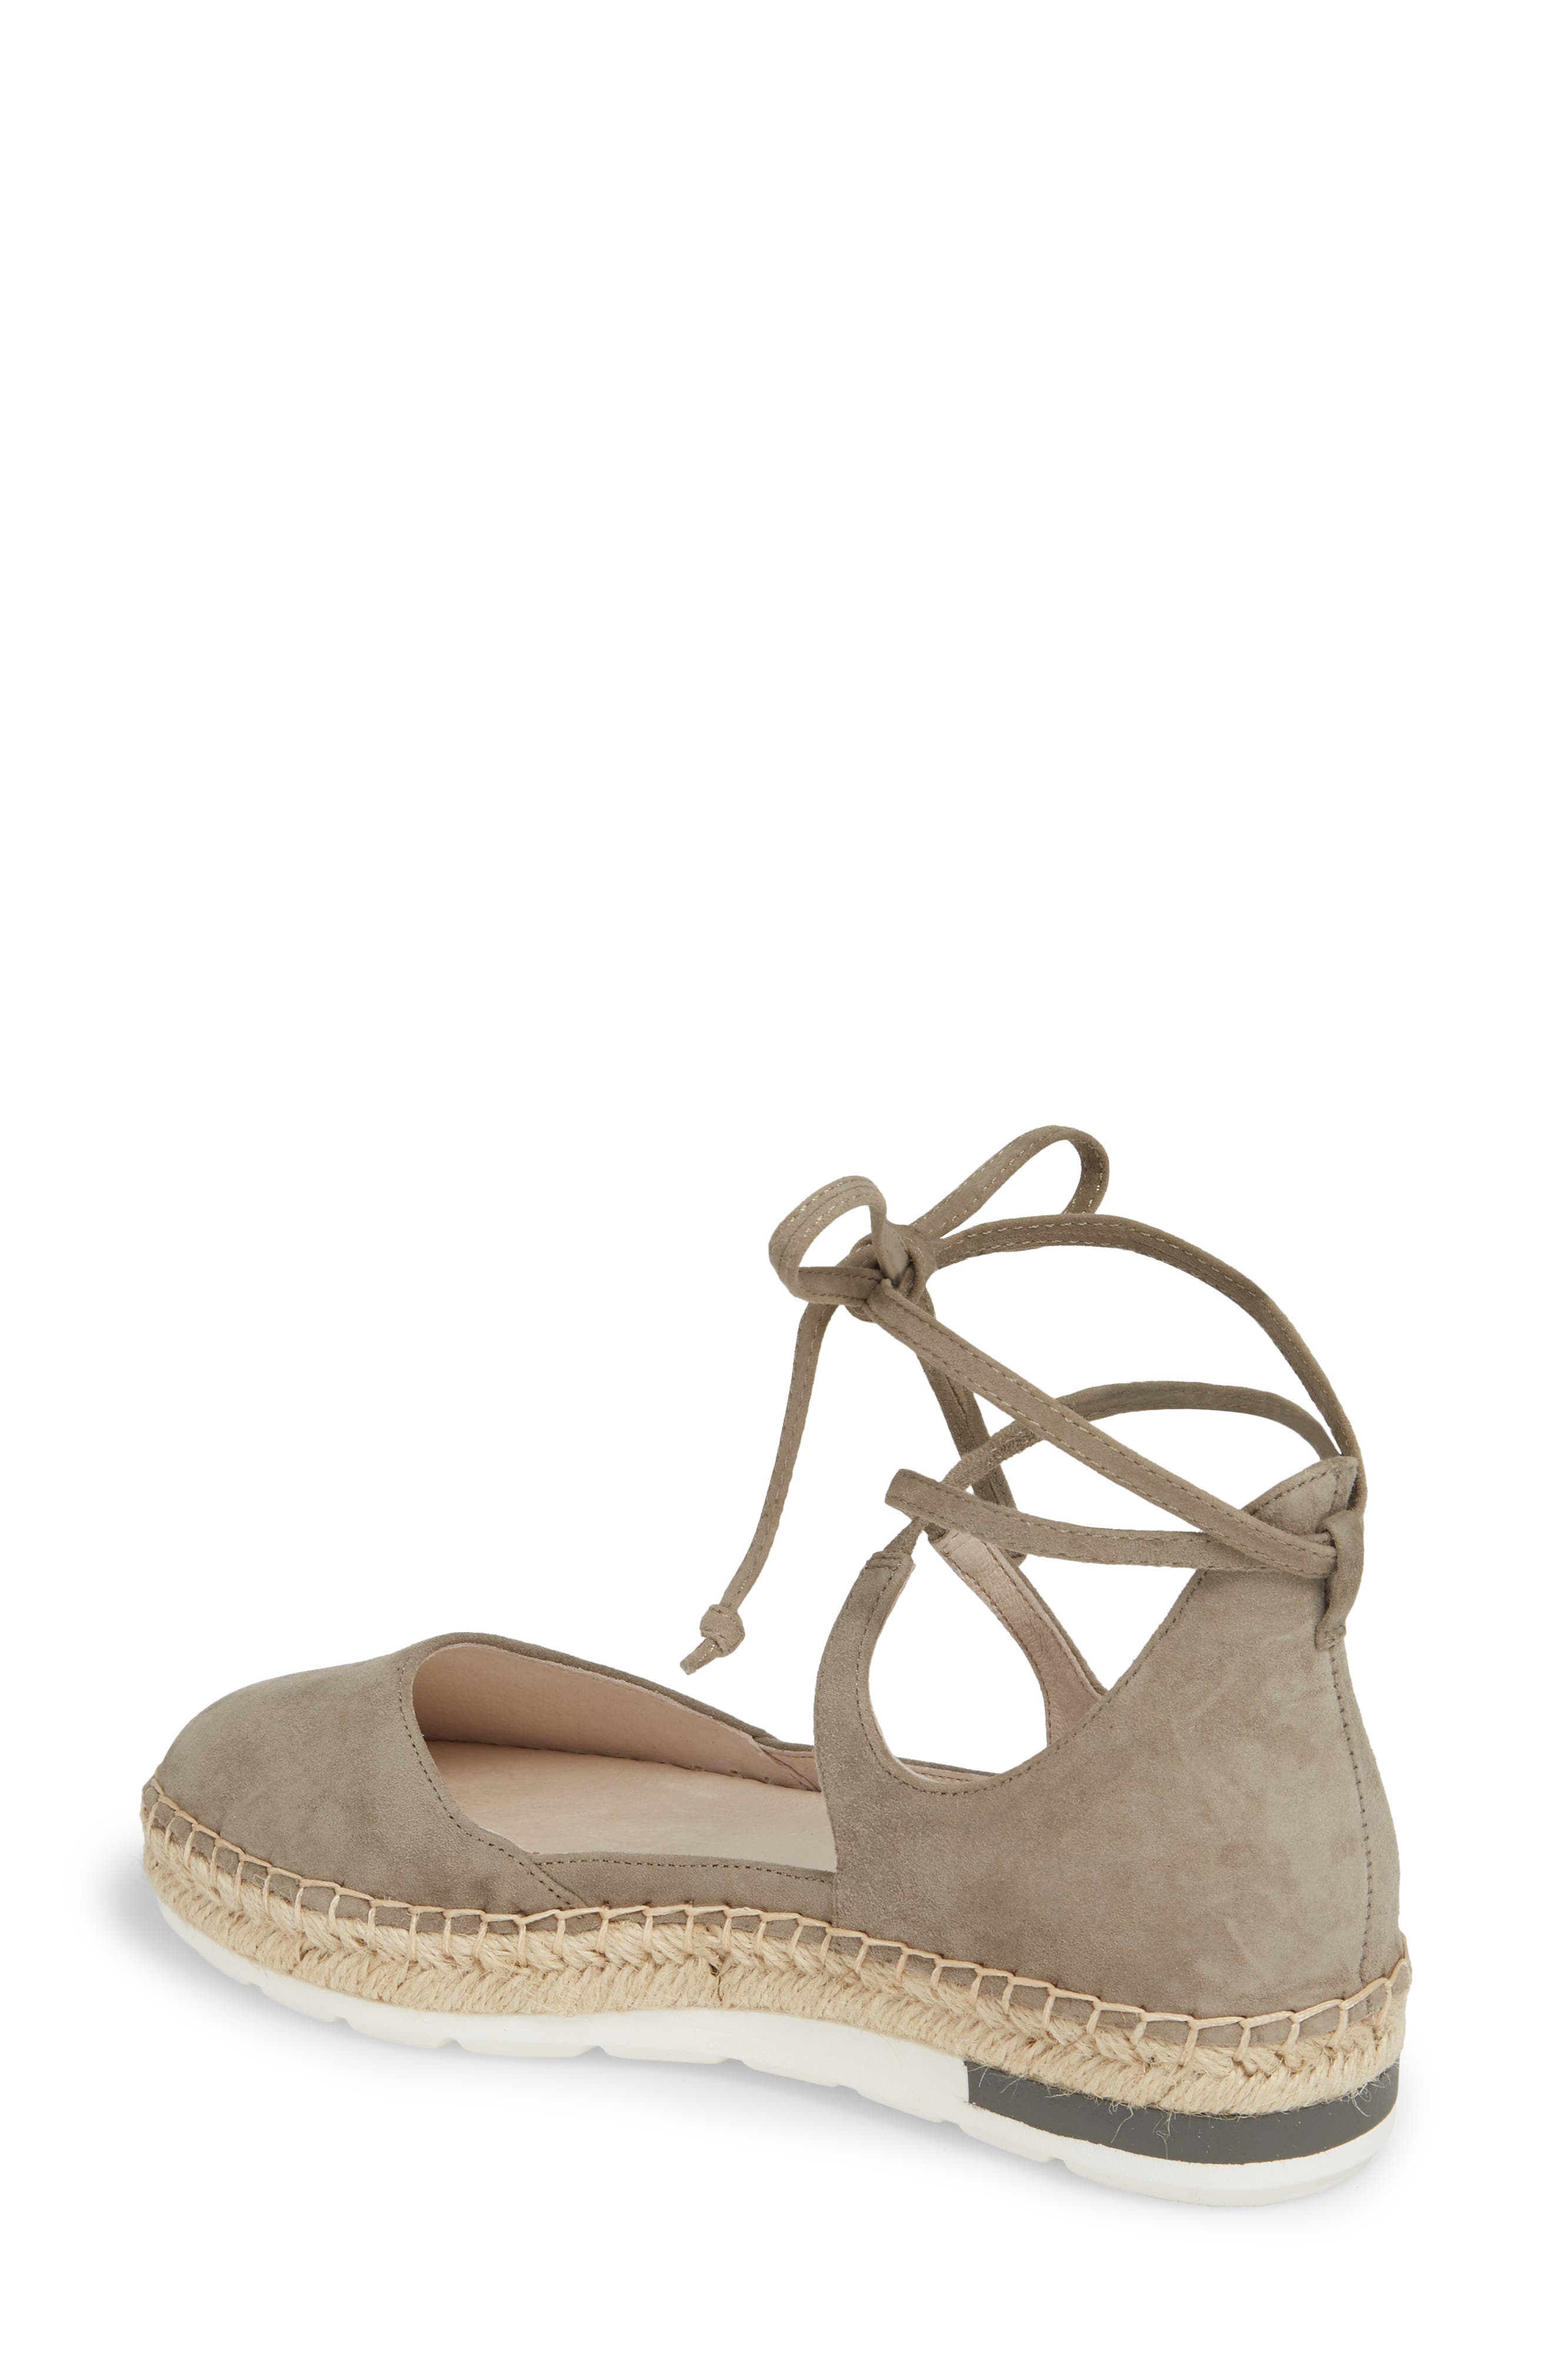 Leena Ankle Strap Sandal,                             Alternate thumbnail 2, color,                             030